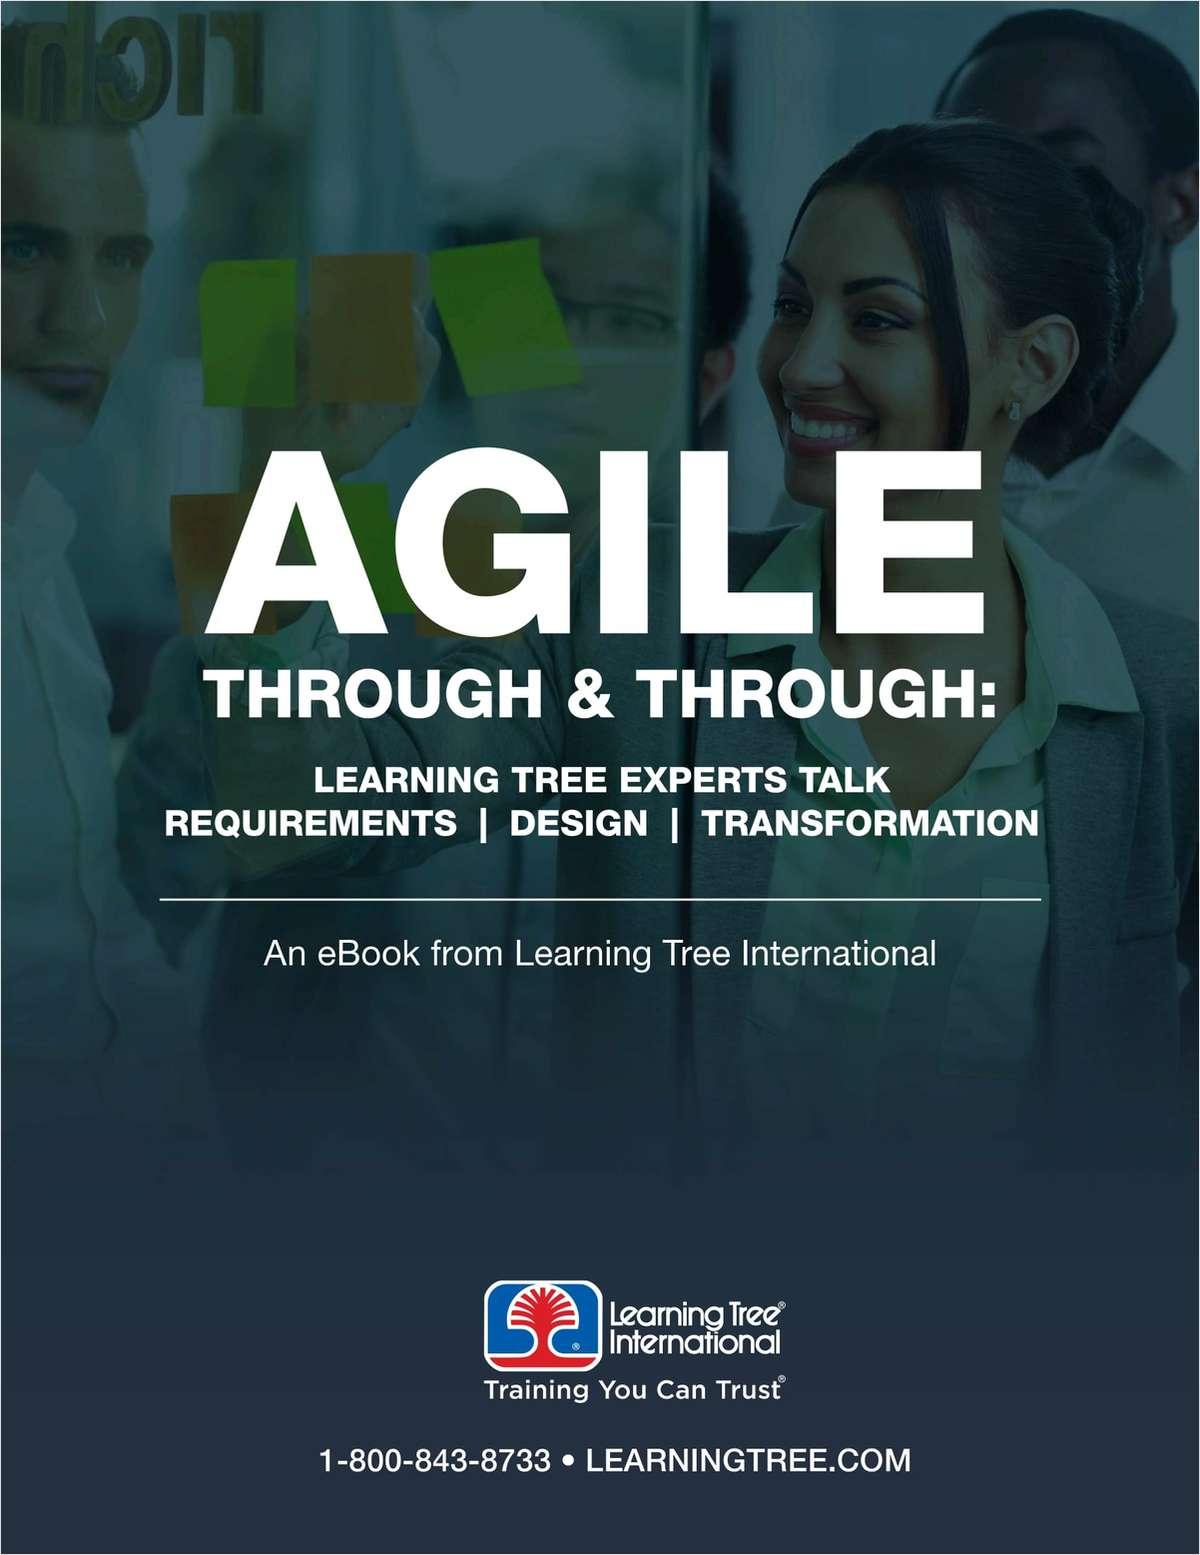 Agile Through & Through